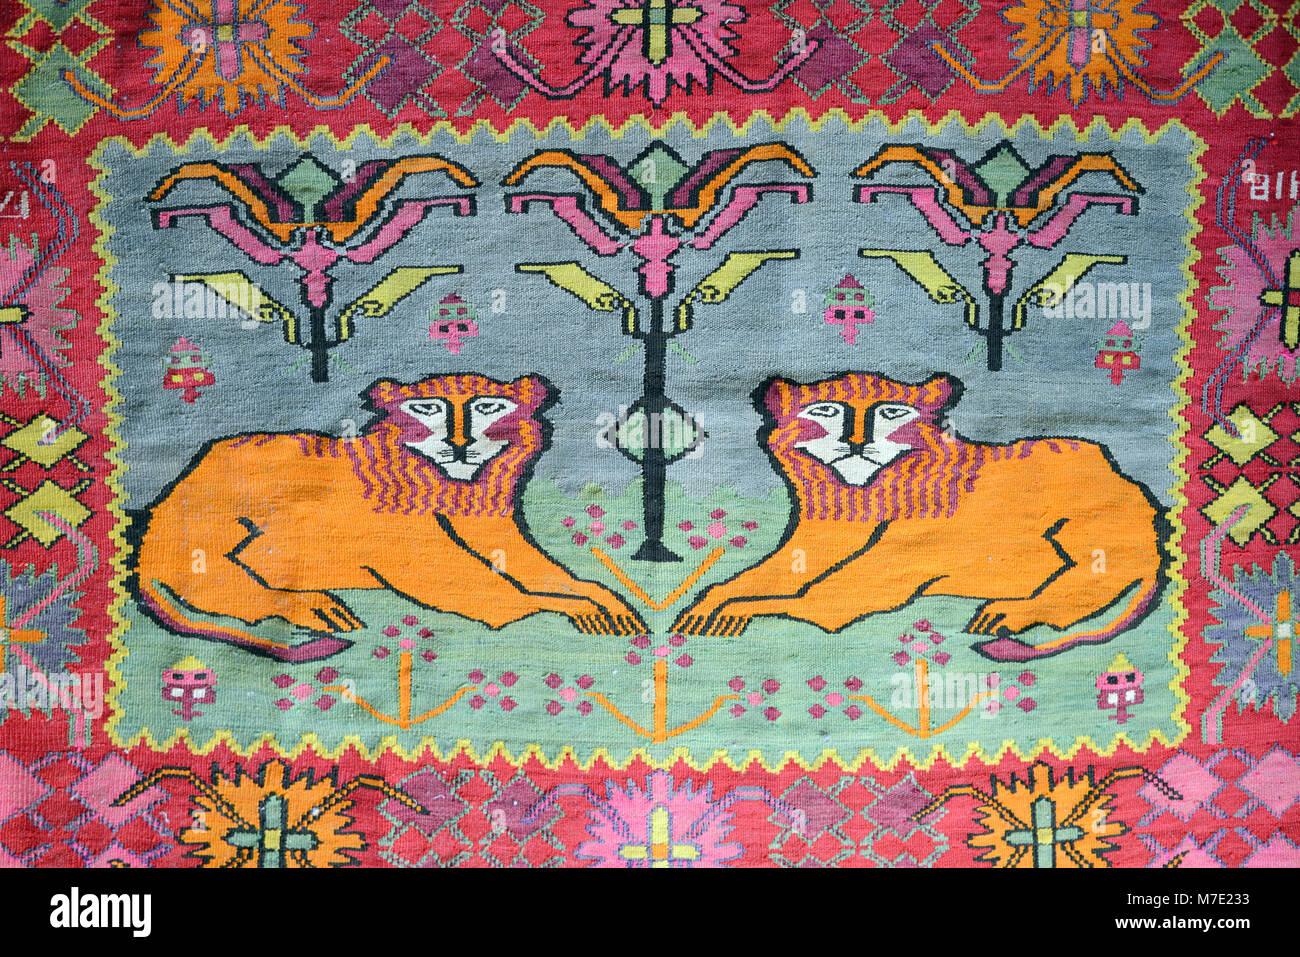 Stylised Lion Motif on Old Armenian Rug, Carpet or Kilim, Armenia - Stock Image